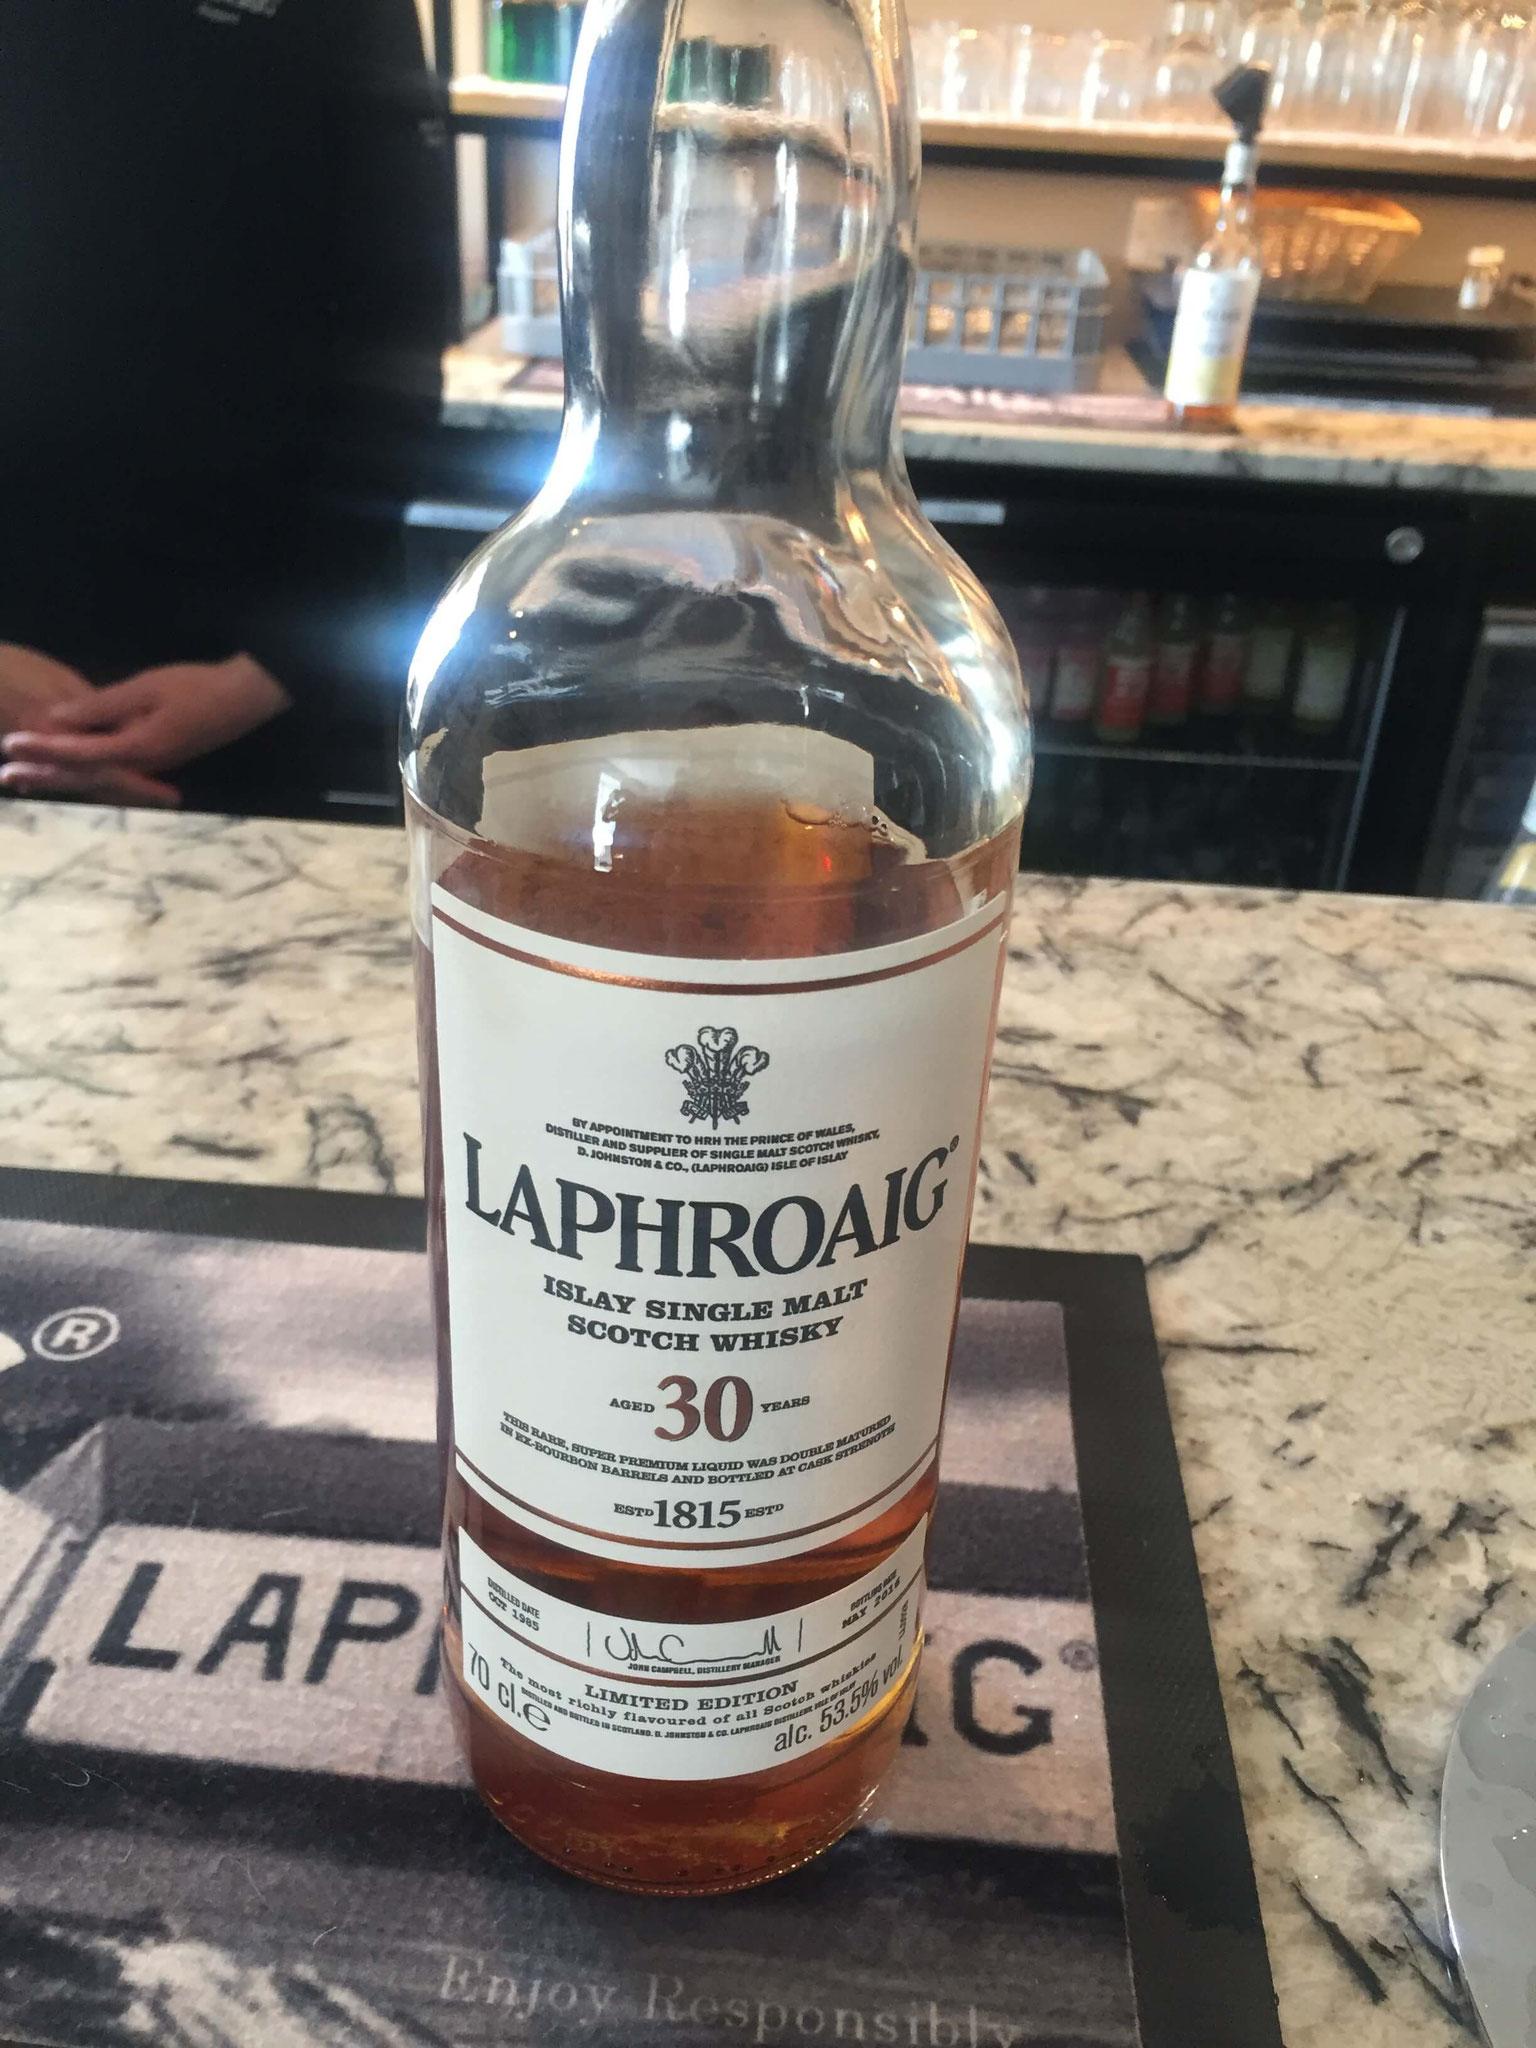 30 y.o. Laphroaig whisky